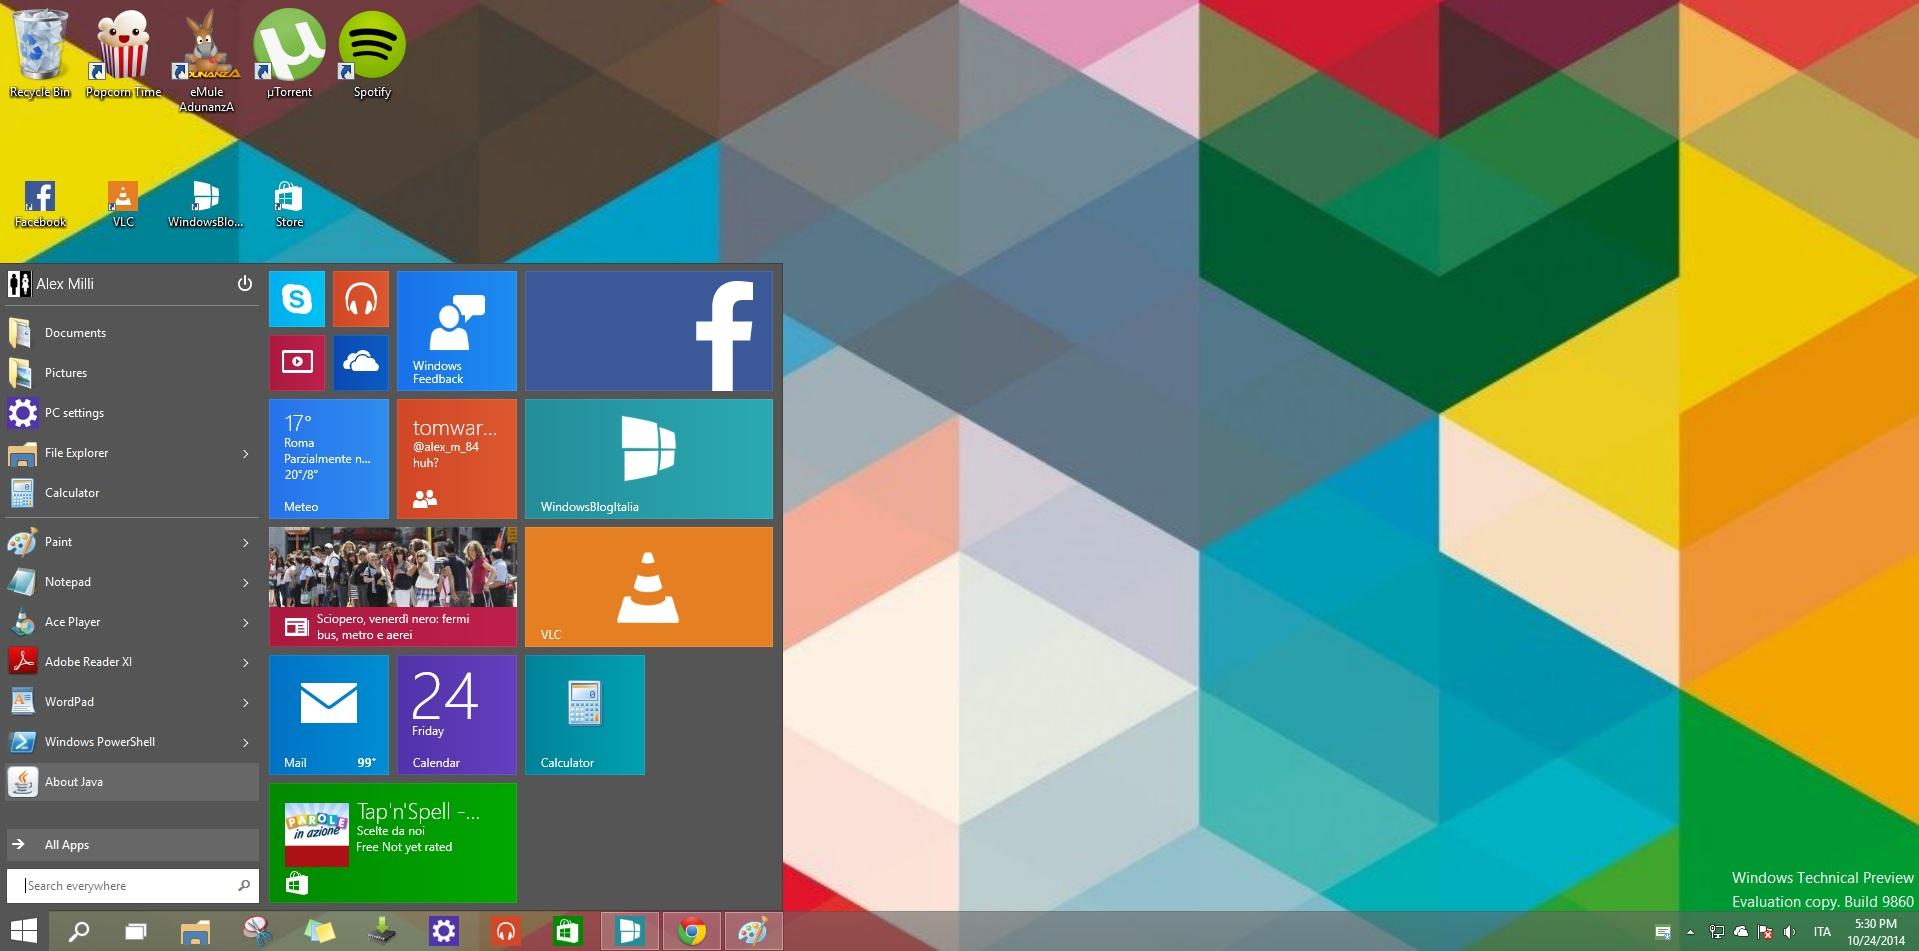 desktop_shortcuts_app_windows_10